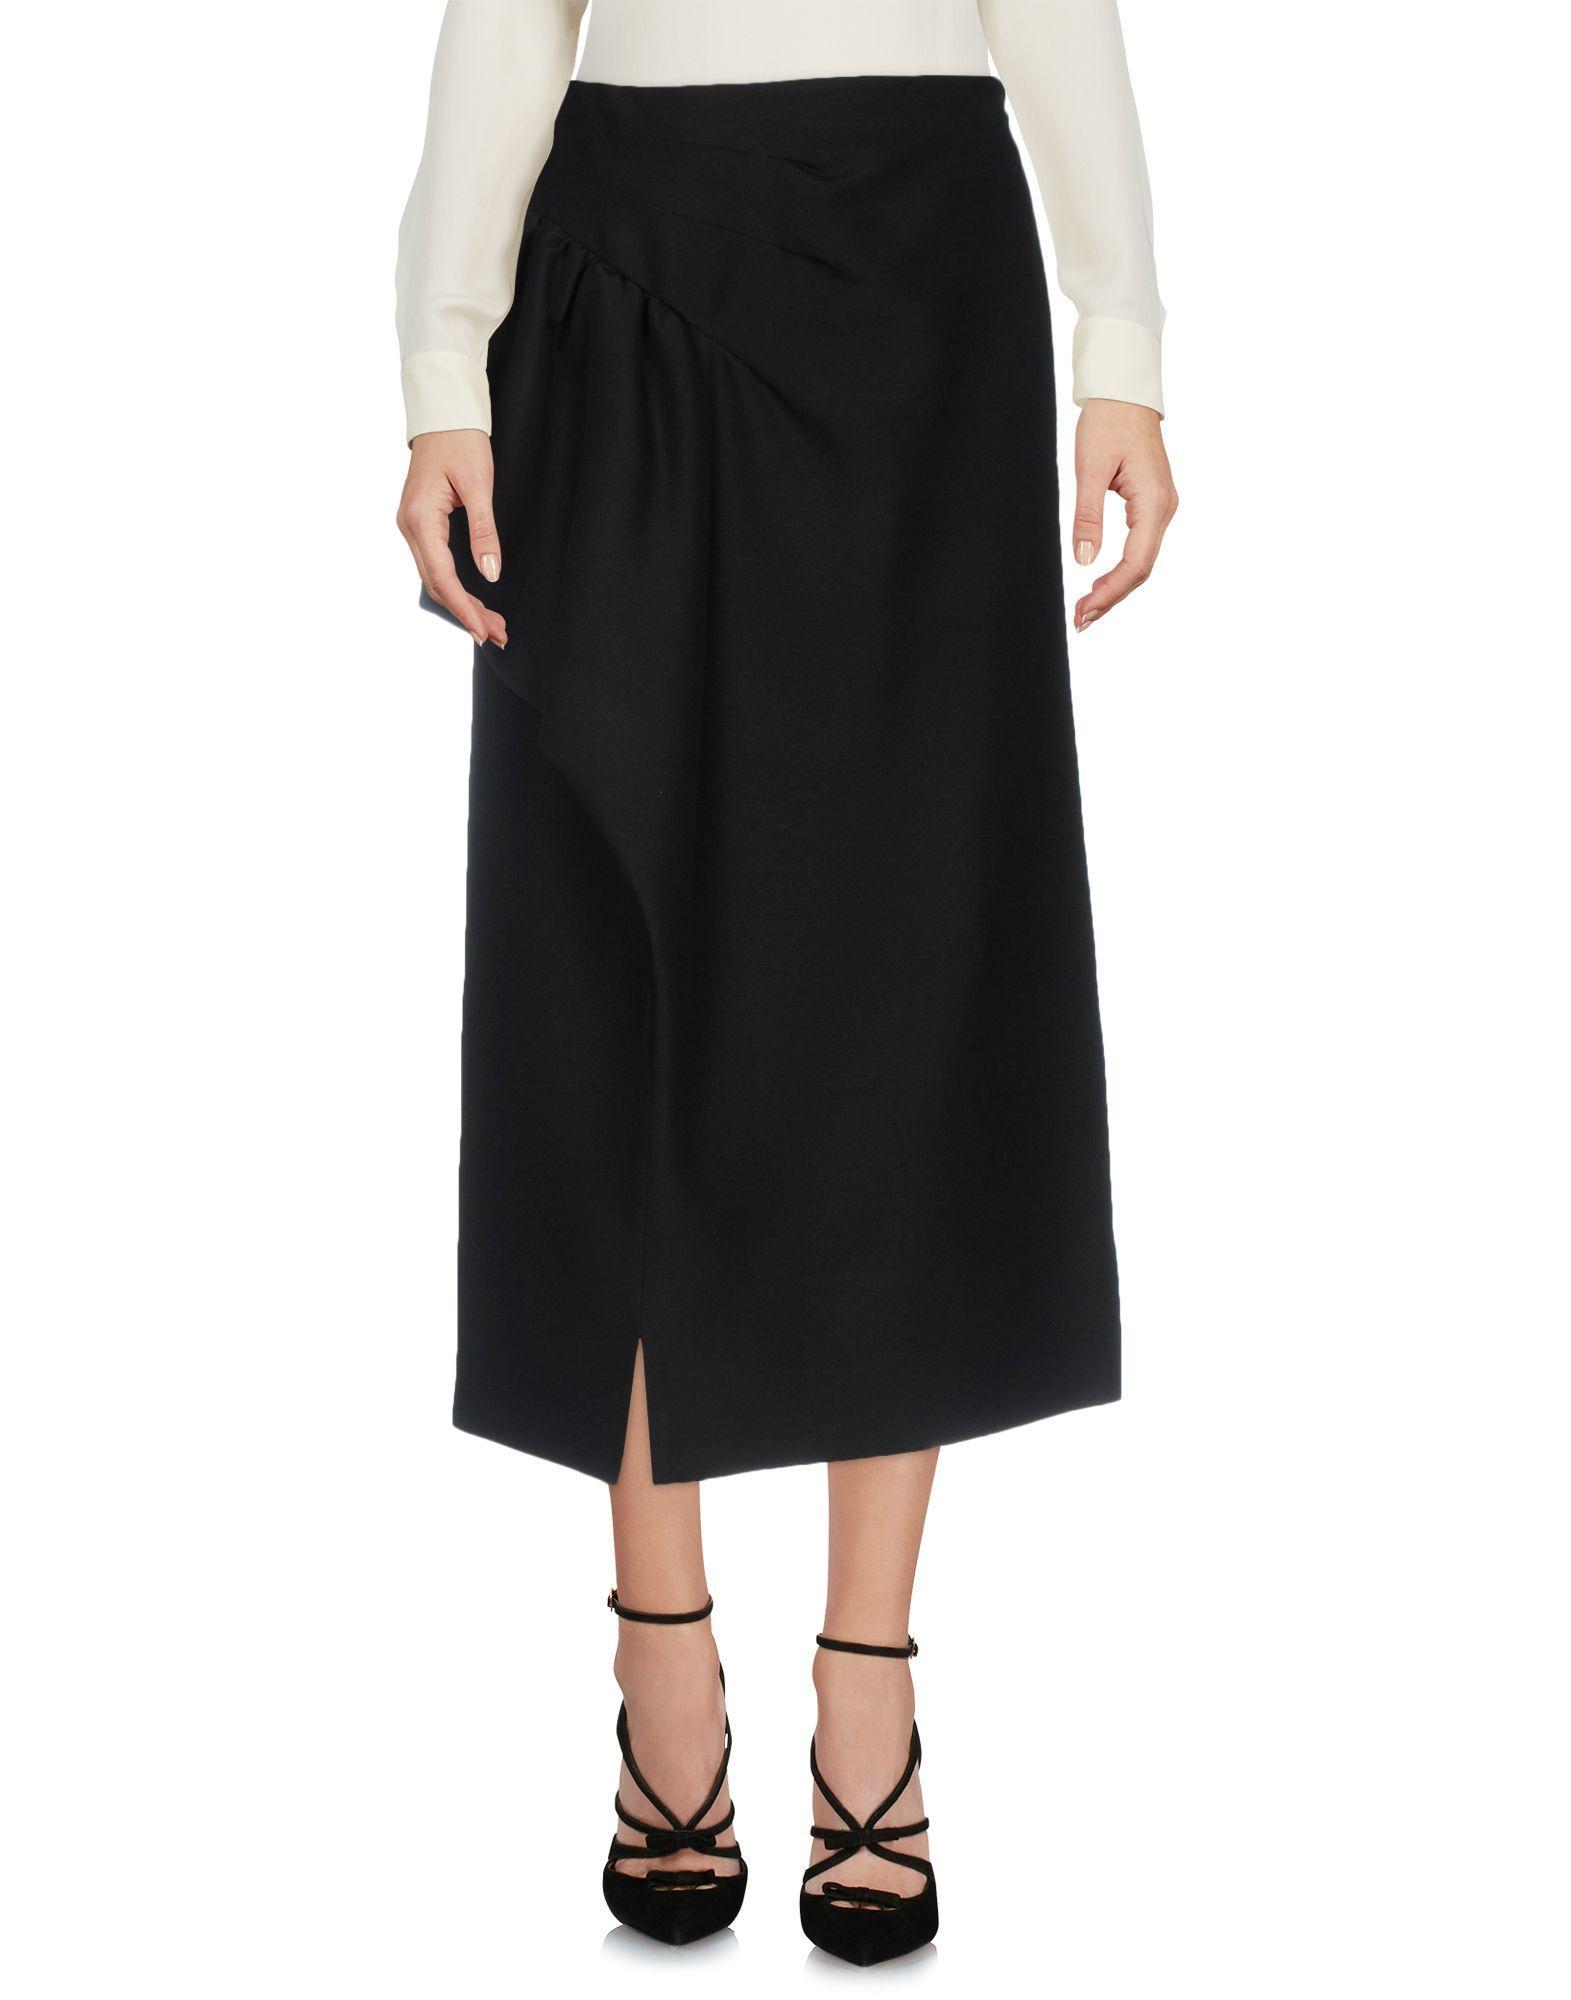 Maison Margiela Midi Skirts In Black